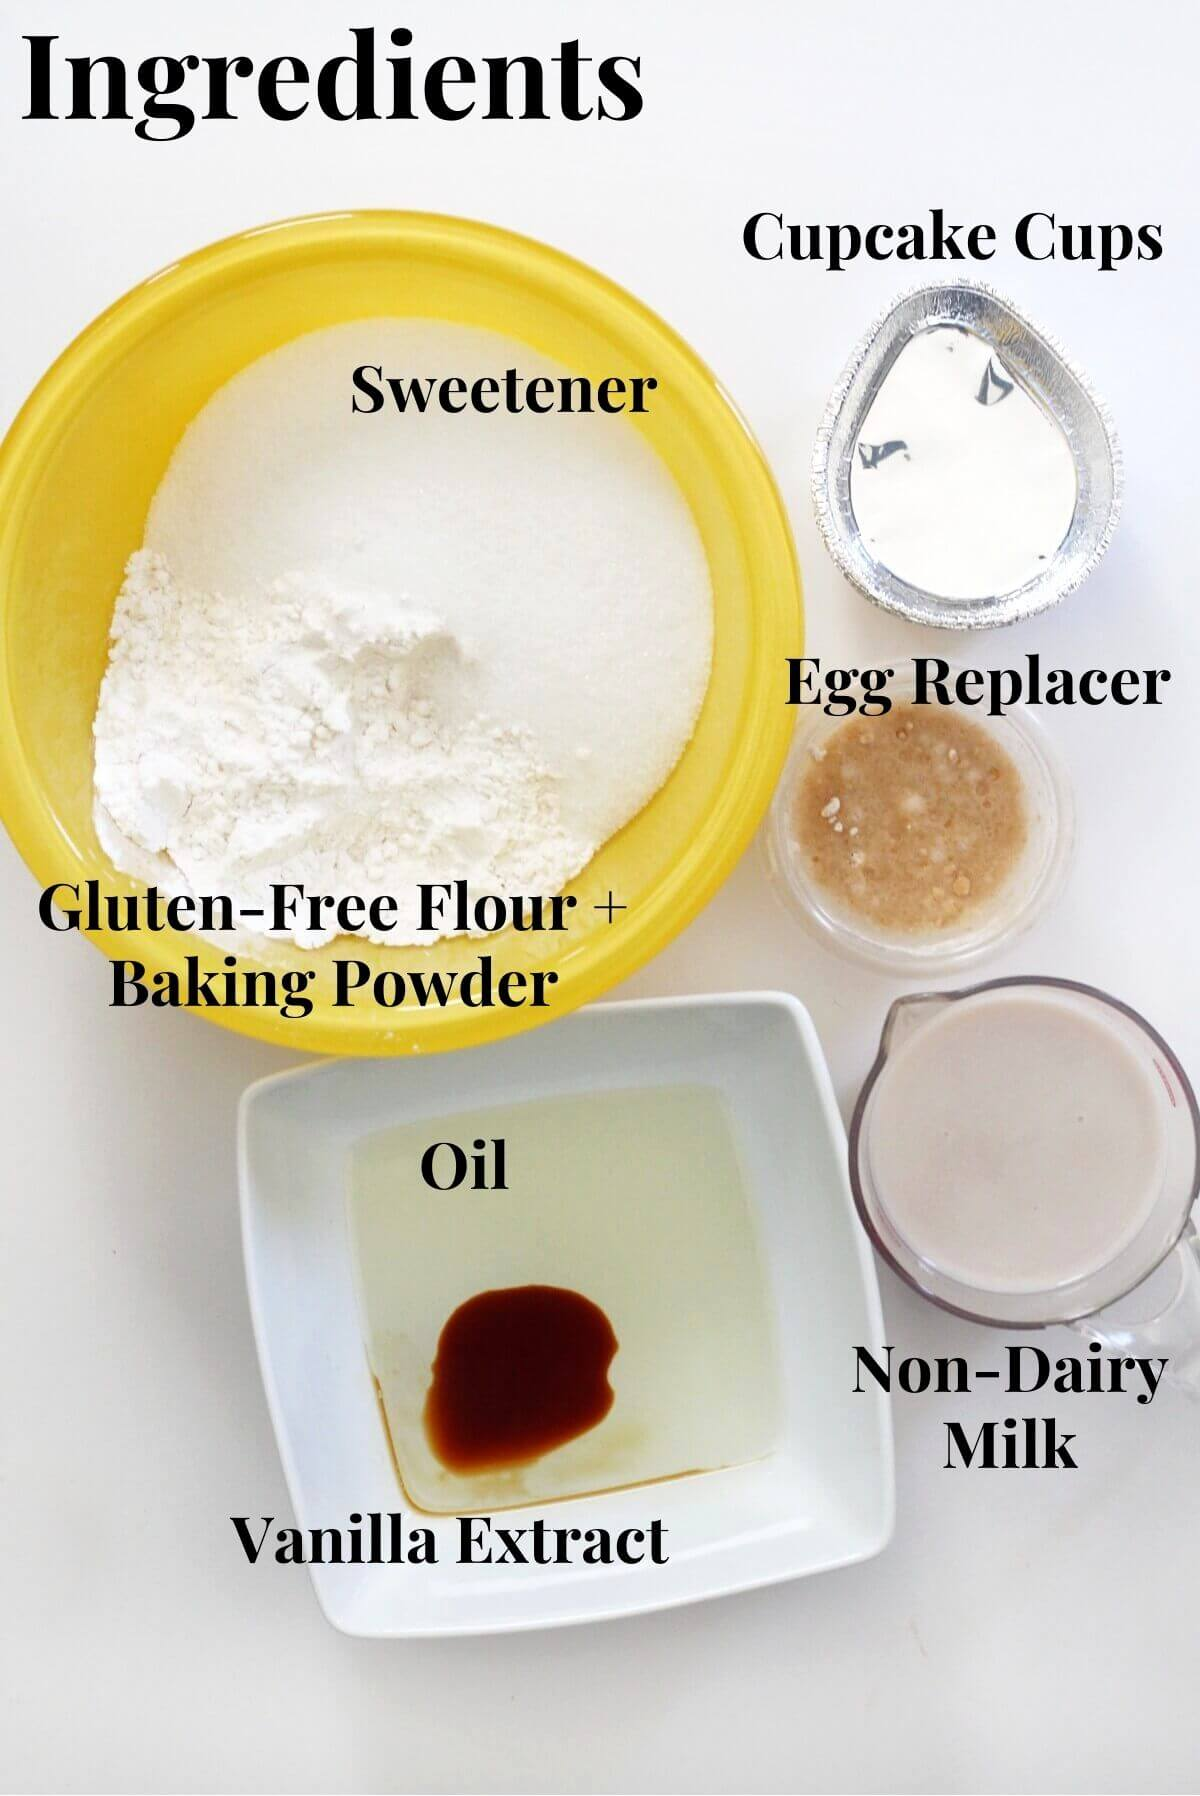 vegan easter egg cupcake ingredients